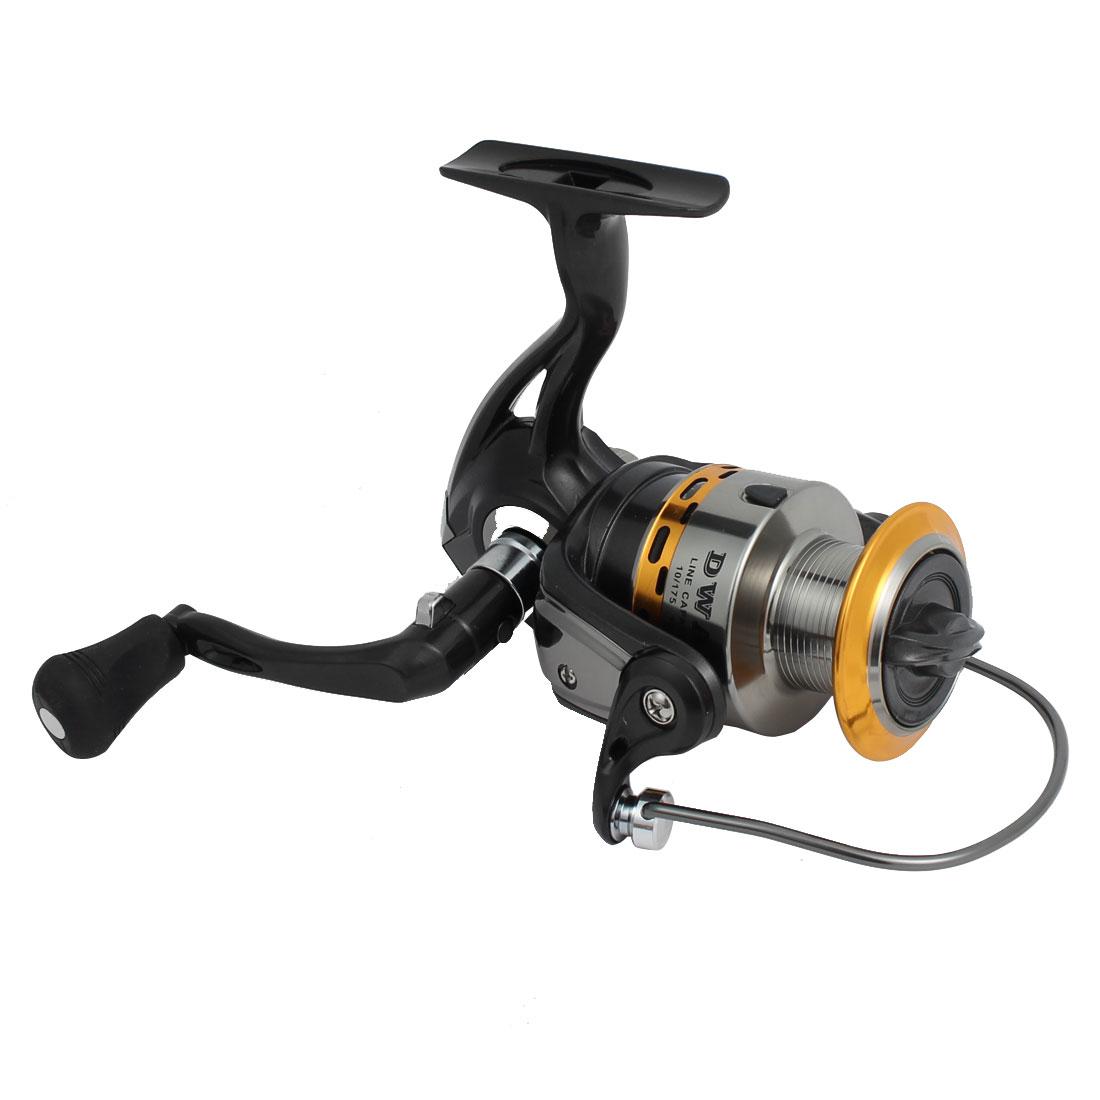 Fisherman Nylon Reinforced Plastic Ratio 5.2:1 Interchangeable Fishing Spinning Reel